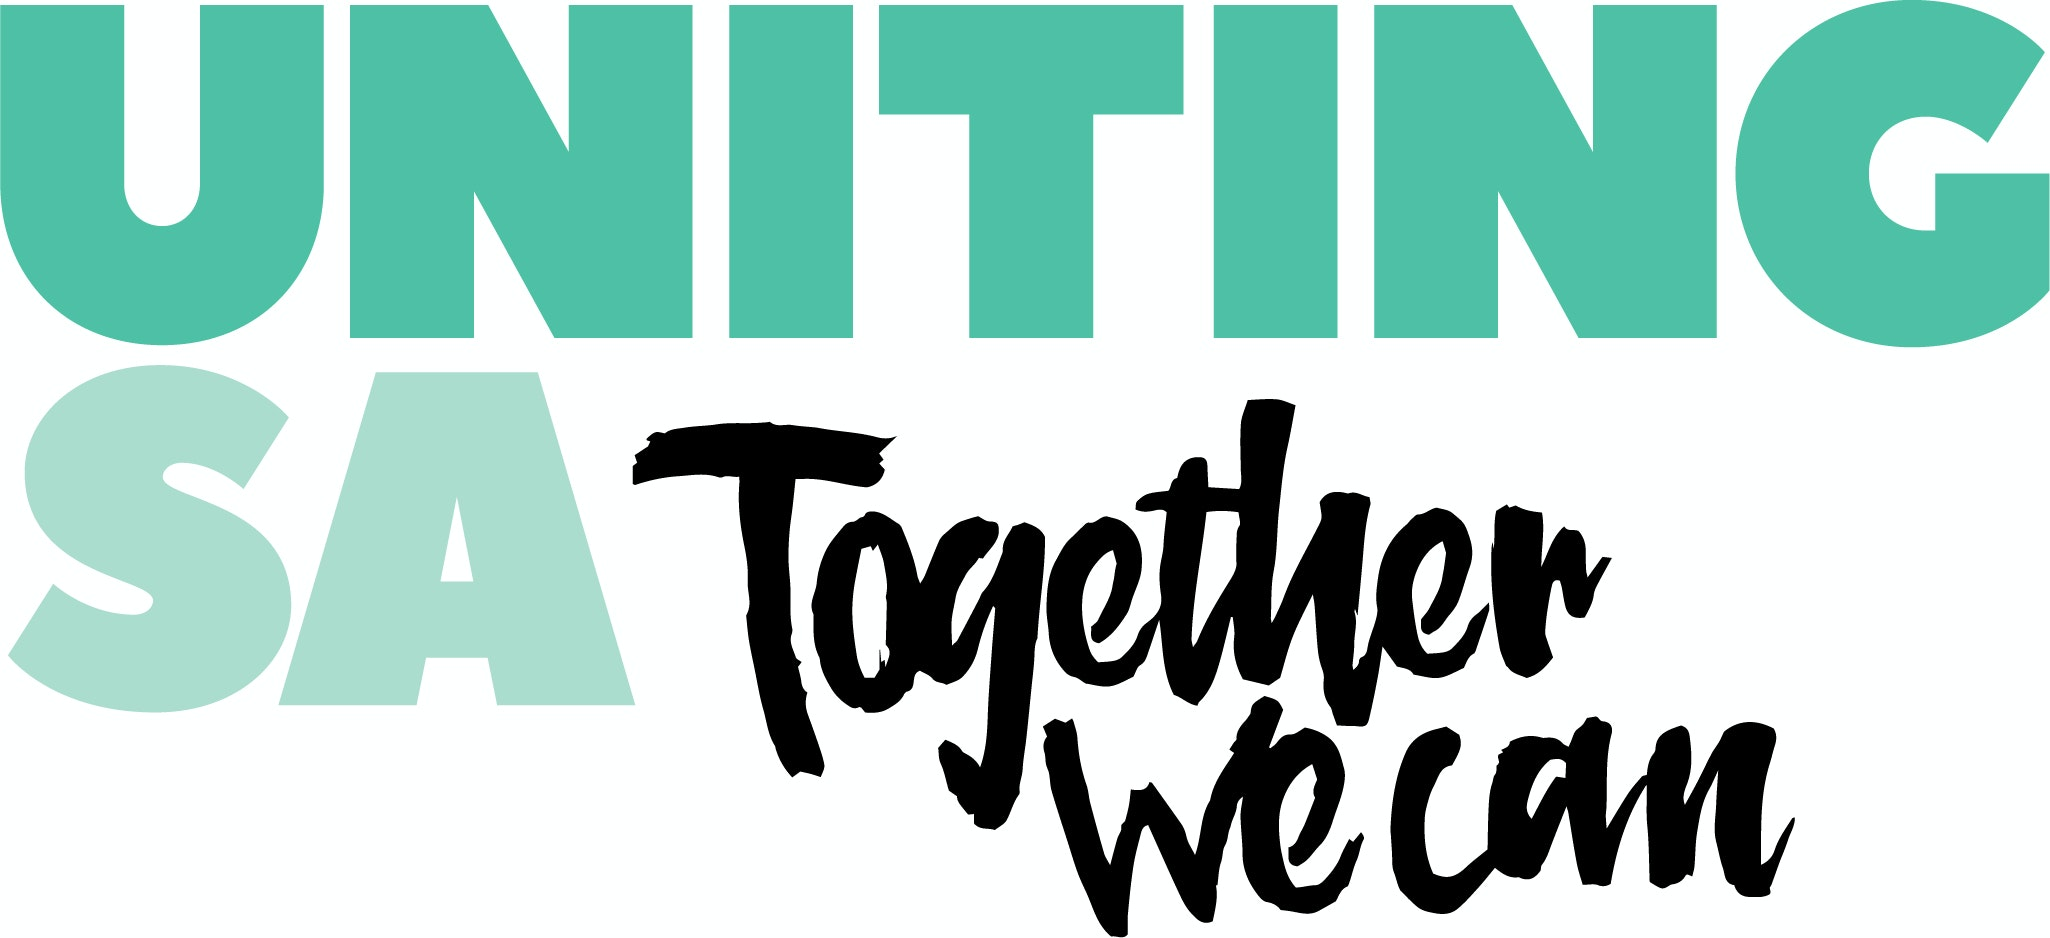 UnitingSA Ethnic Link Services logo